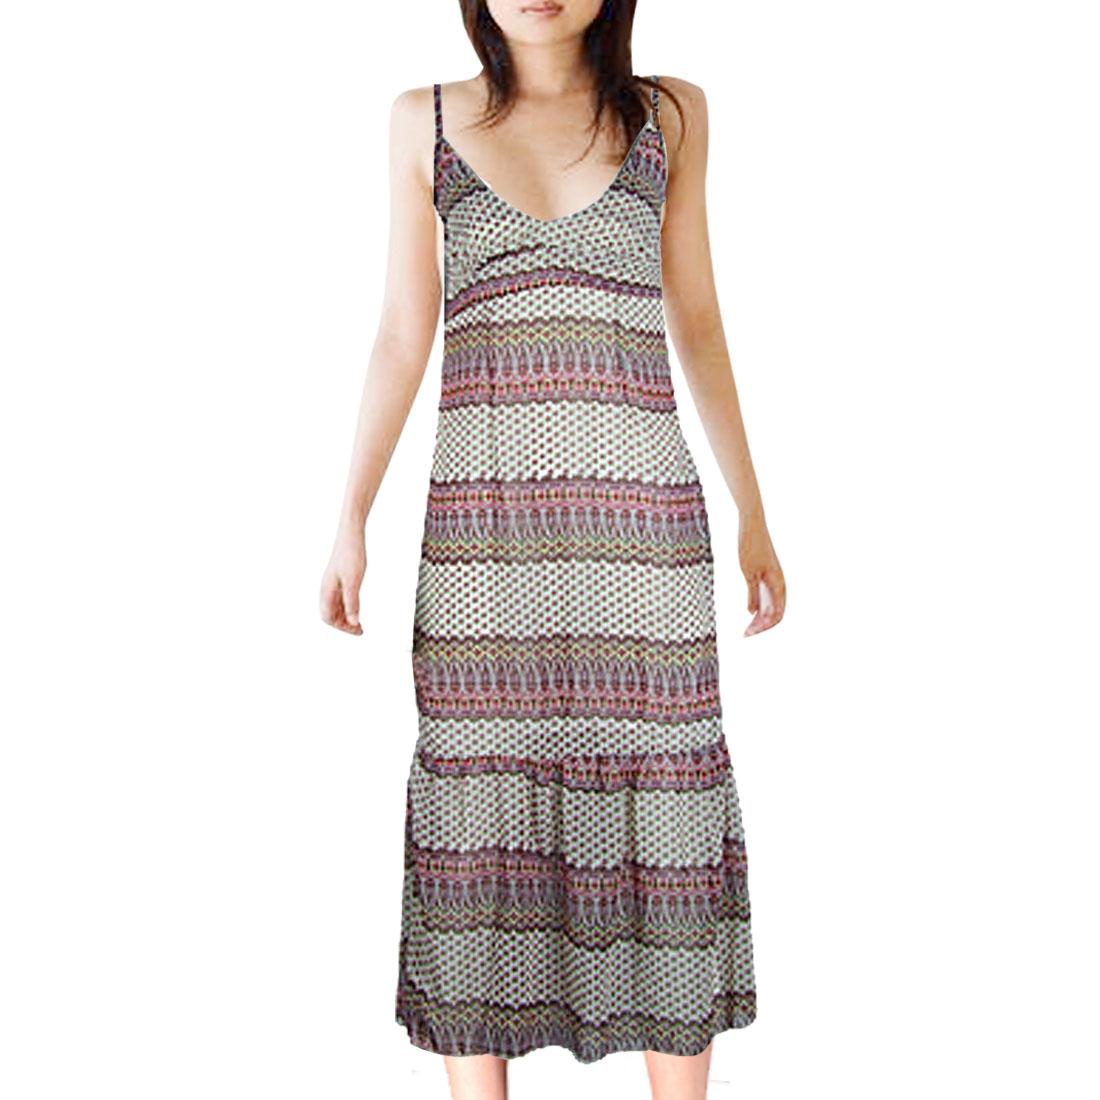 XS Chiffon Printed Spaghetti Straps Dress for Ladies